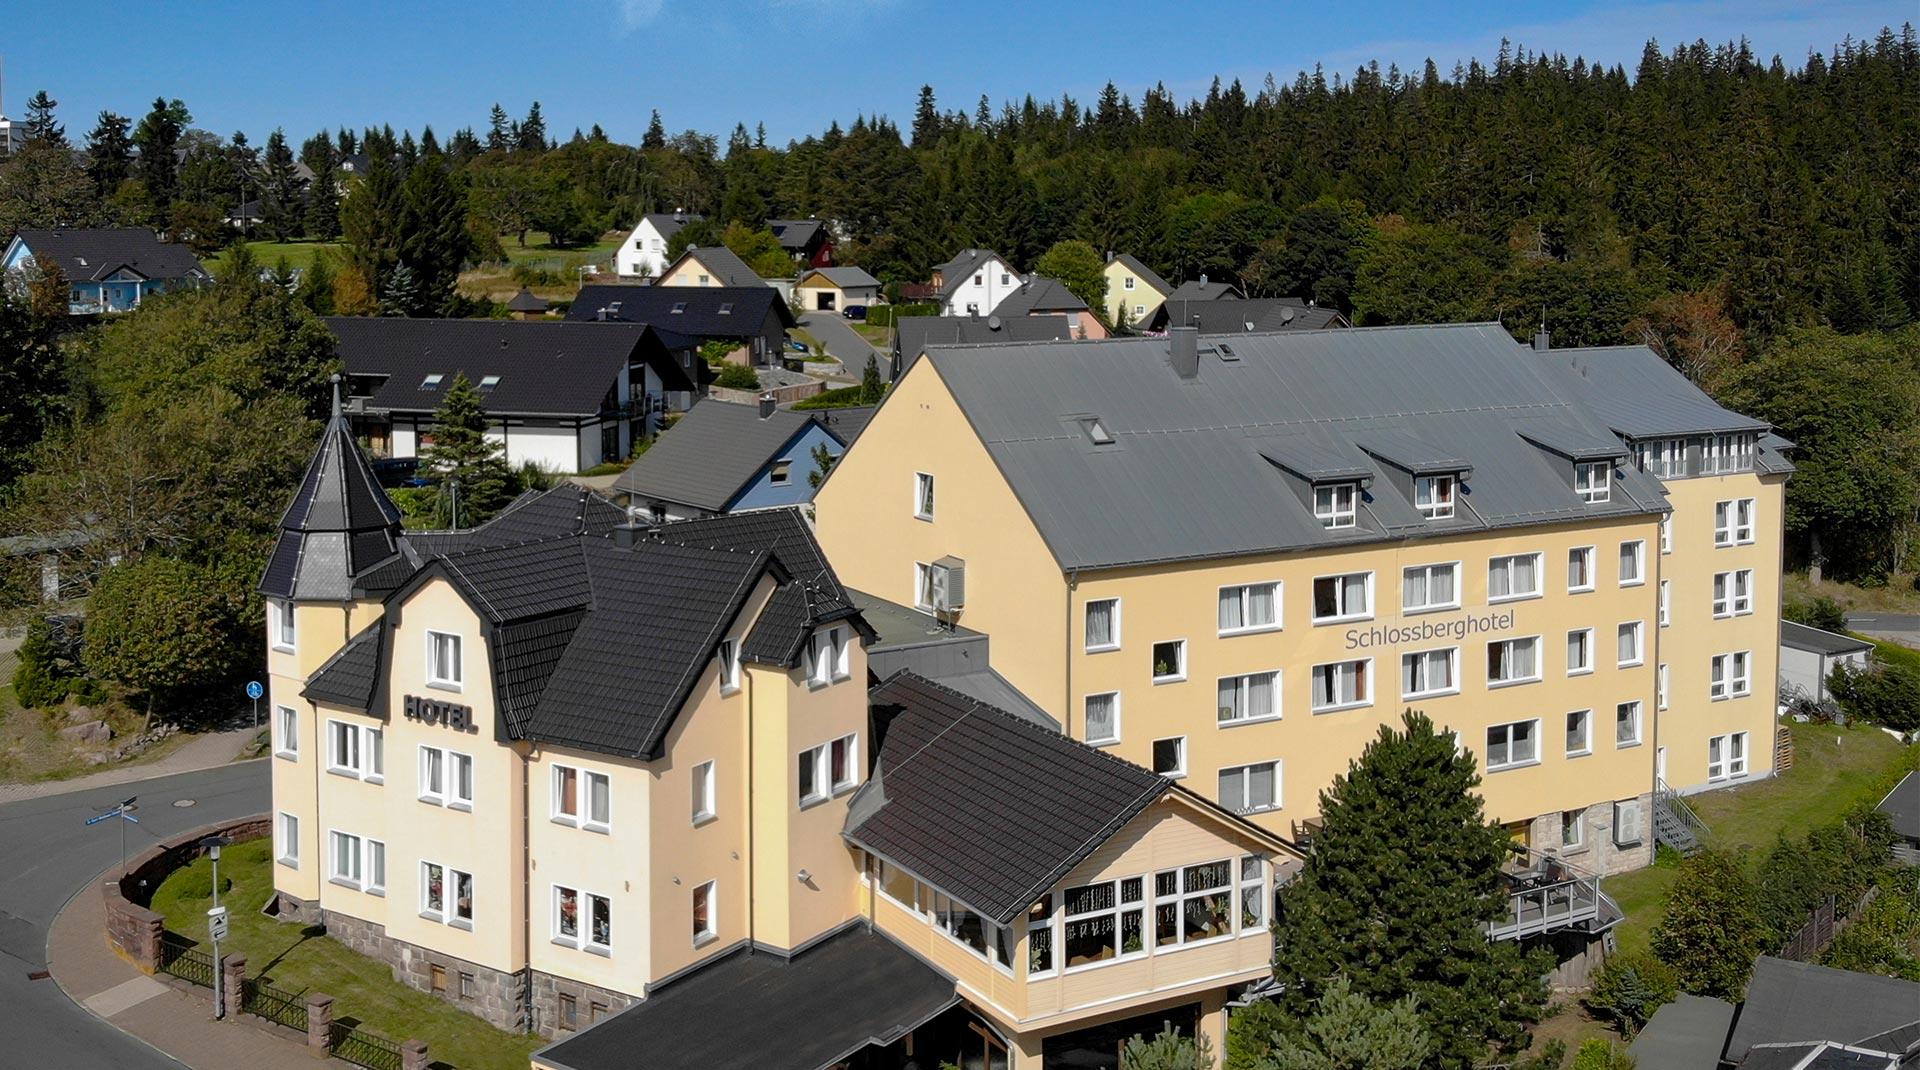 Schlossberghotel Oberhof Luftaufnahme | Oberhof Hotel Urlaub im Thüringenschanze